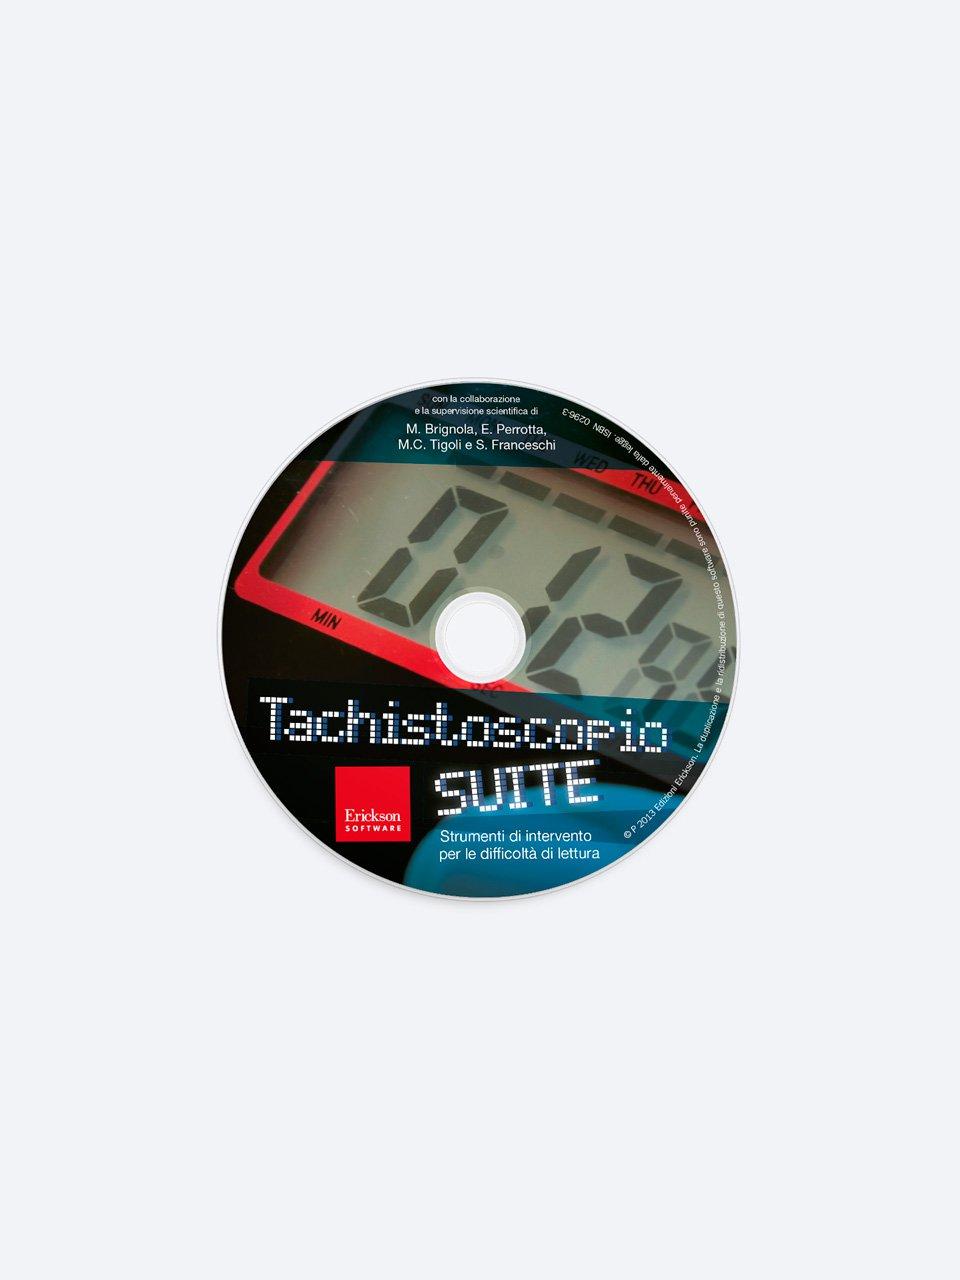 Tachistoscopio SUITE - App e software - Erickson